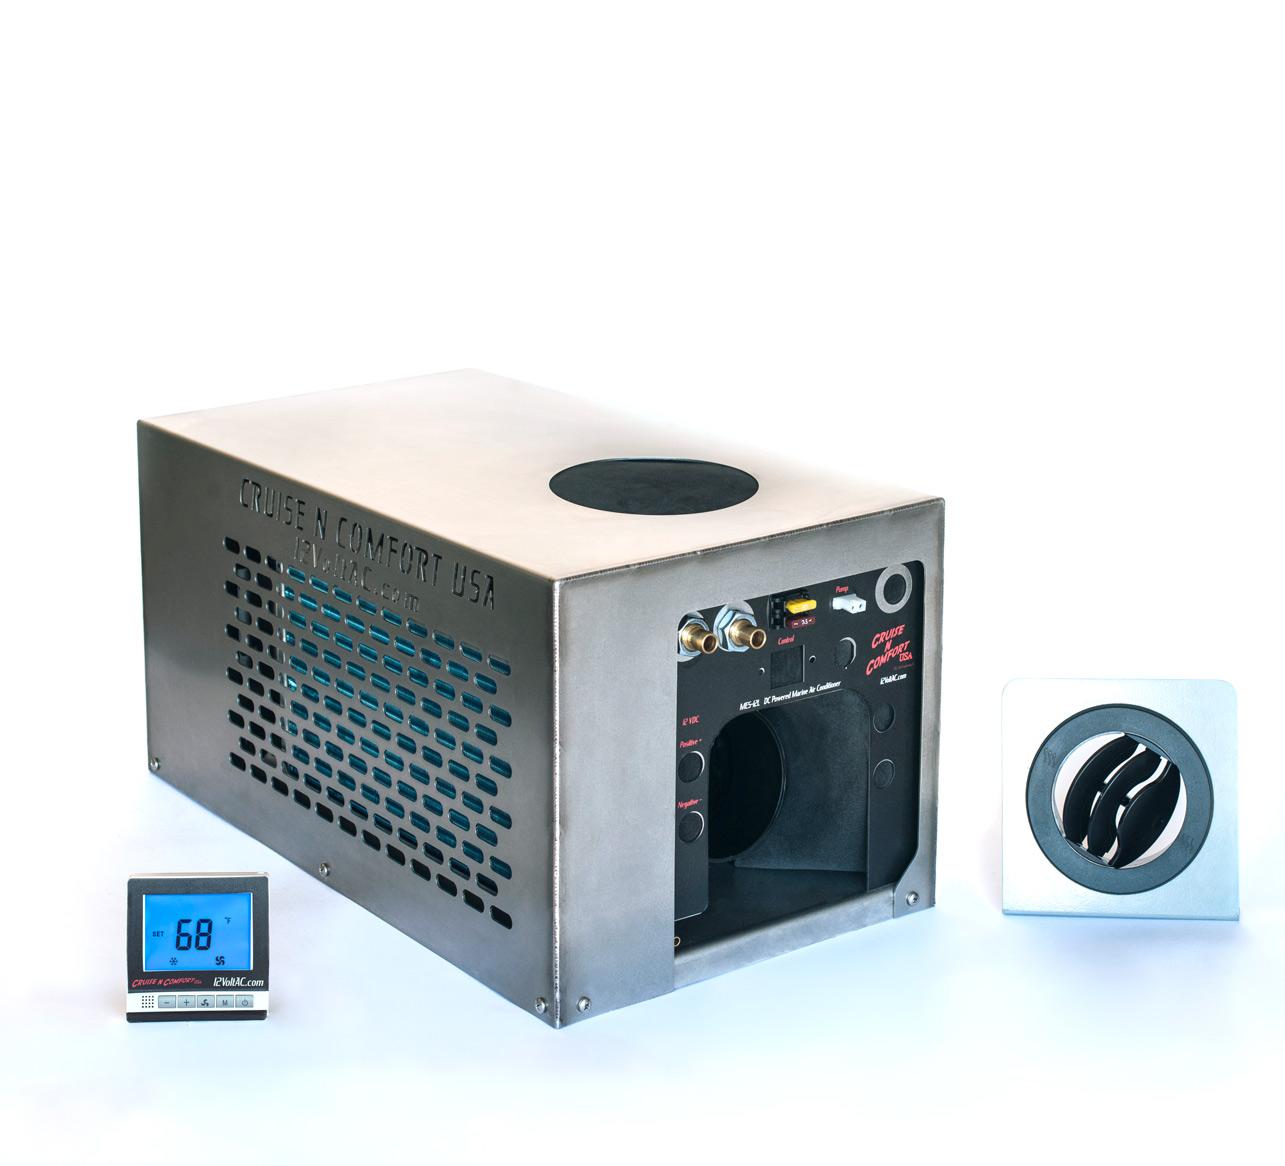 Mes 12l - 12 Volt Dc Mini Split System Air Conditioner Cruise Comfort Usa